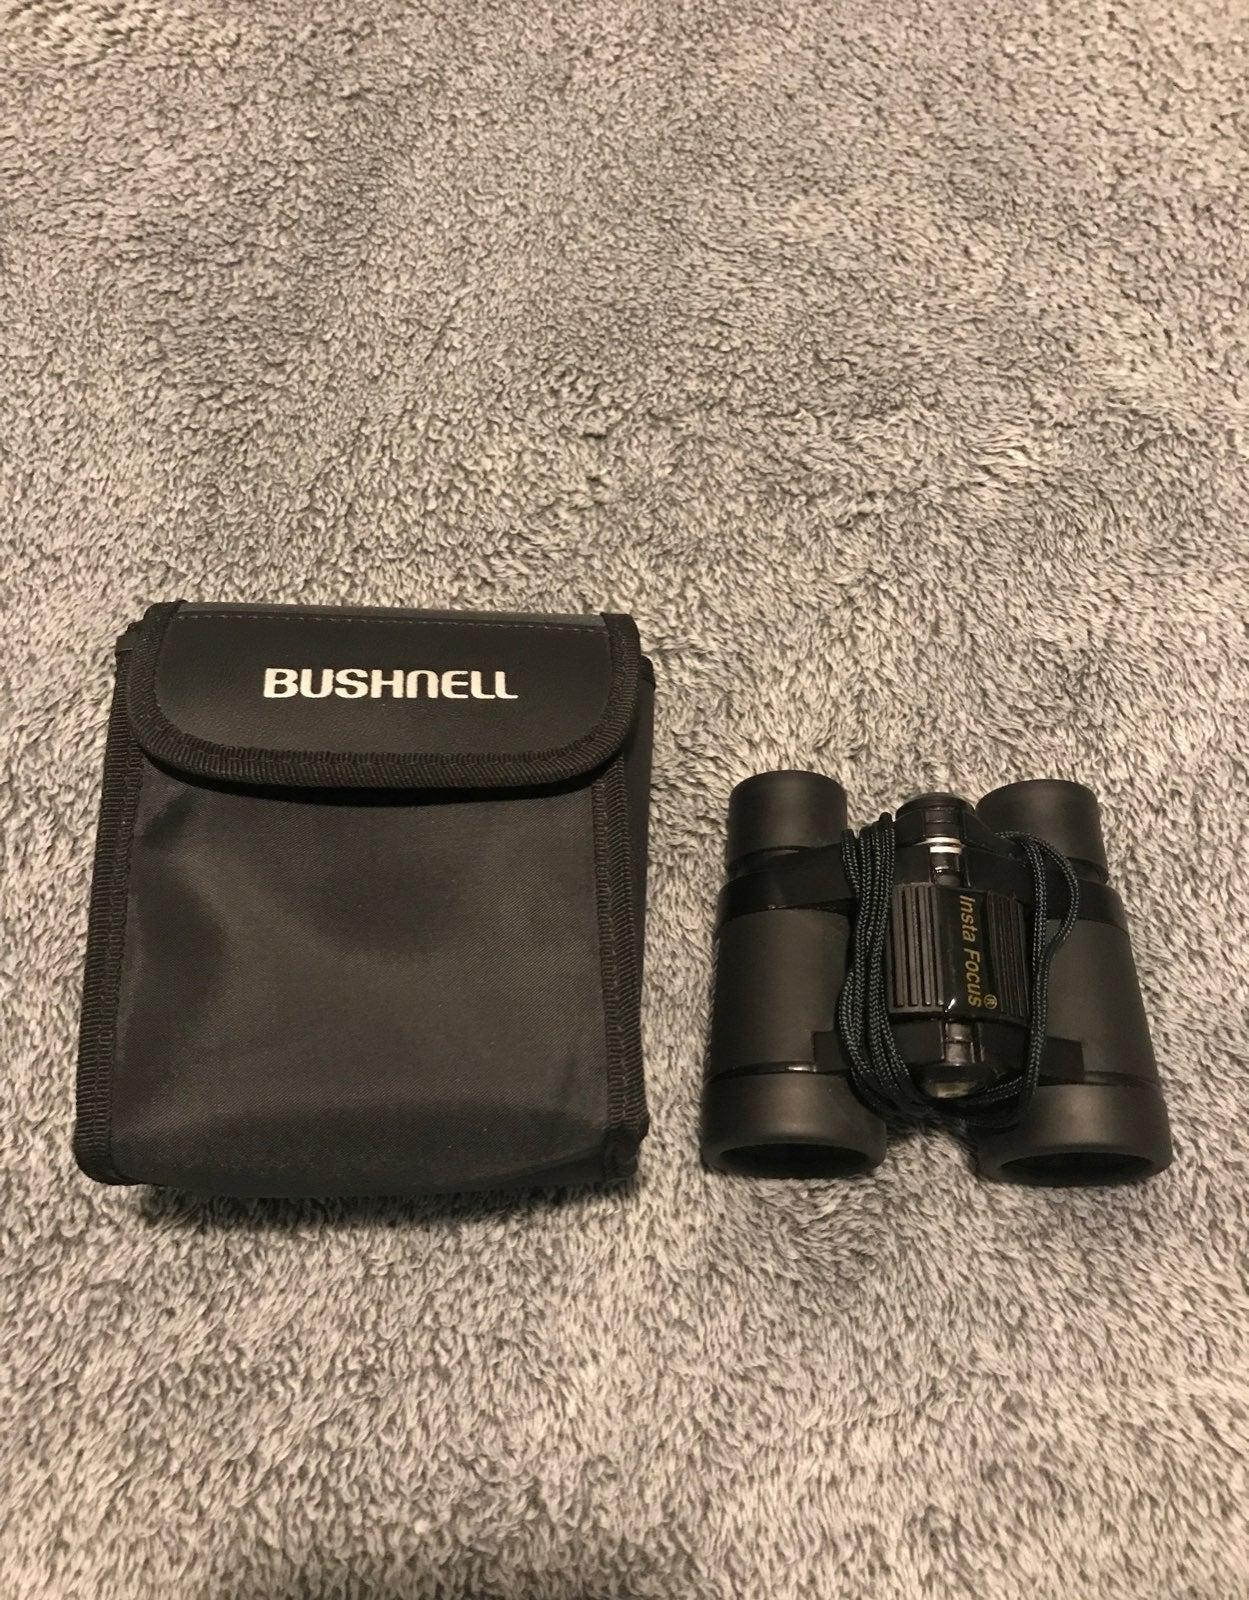 Bushnell 4x30 binoculars